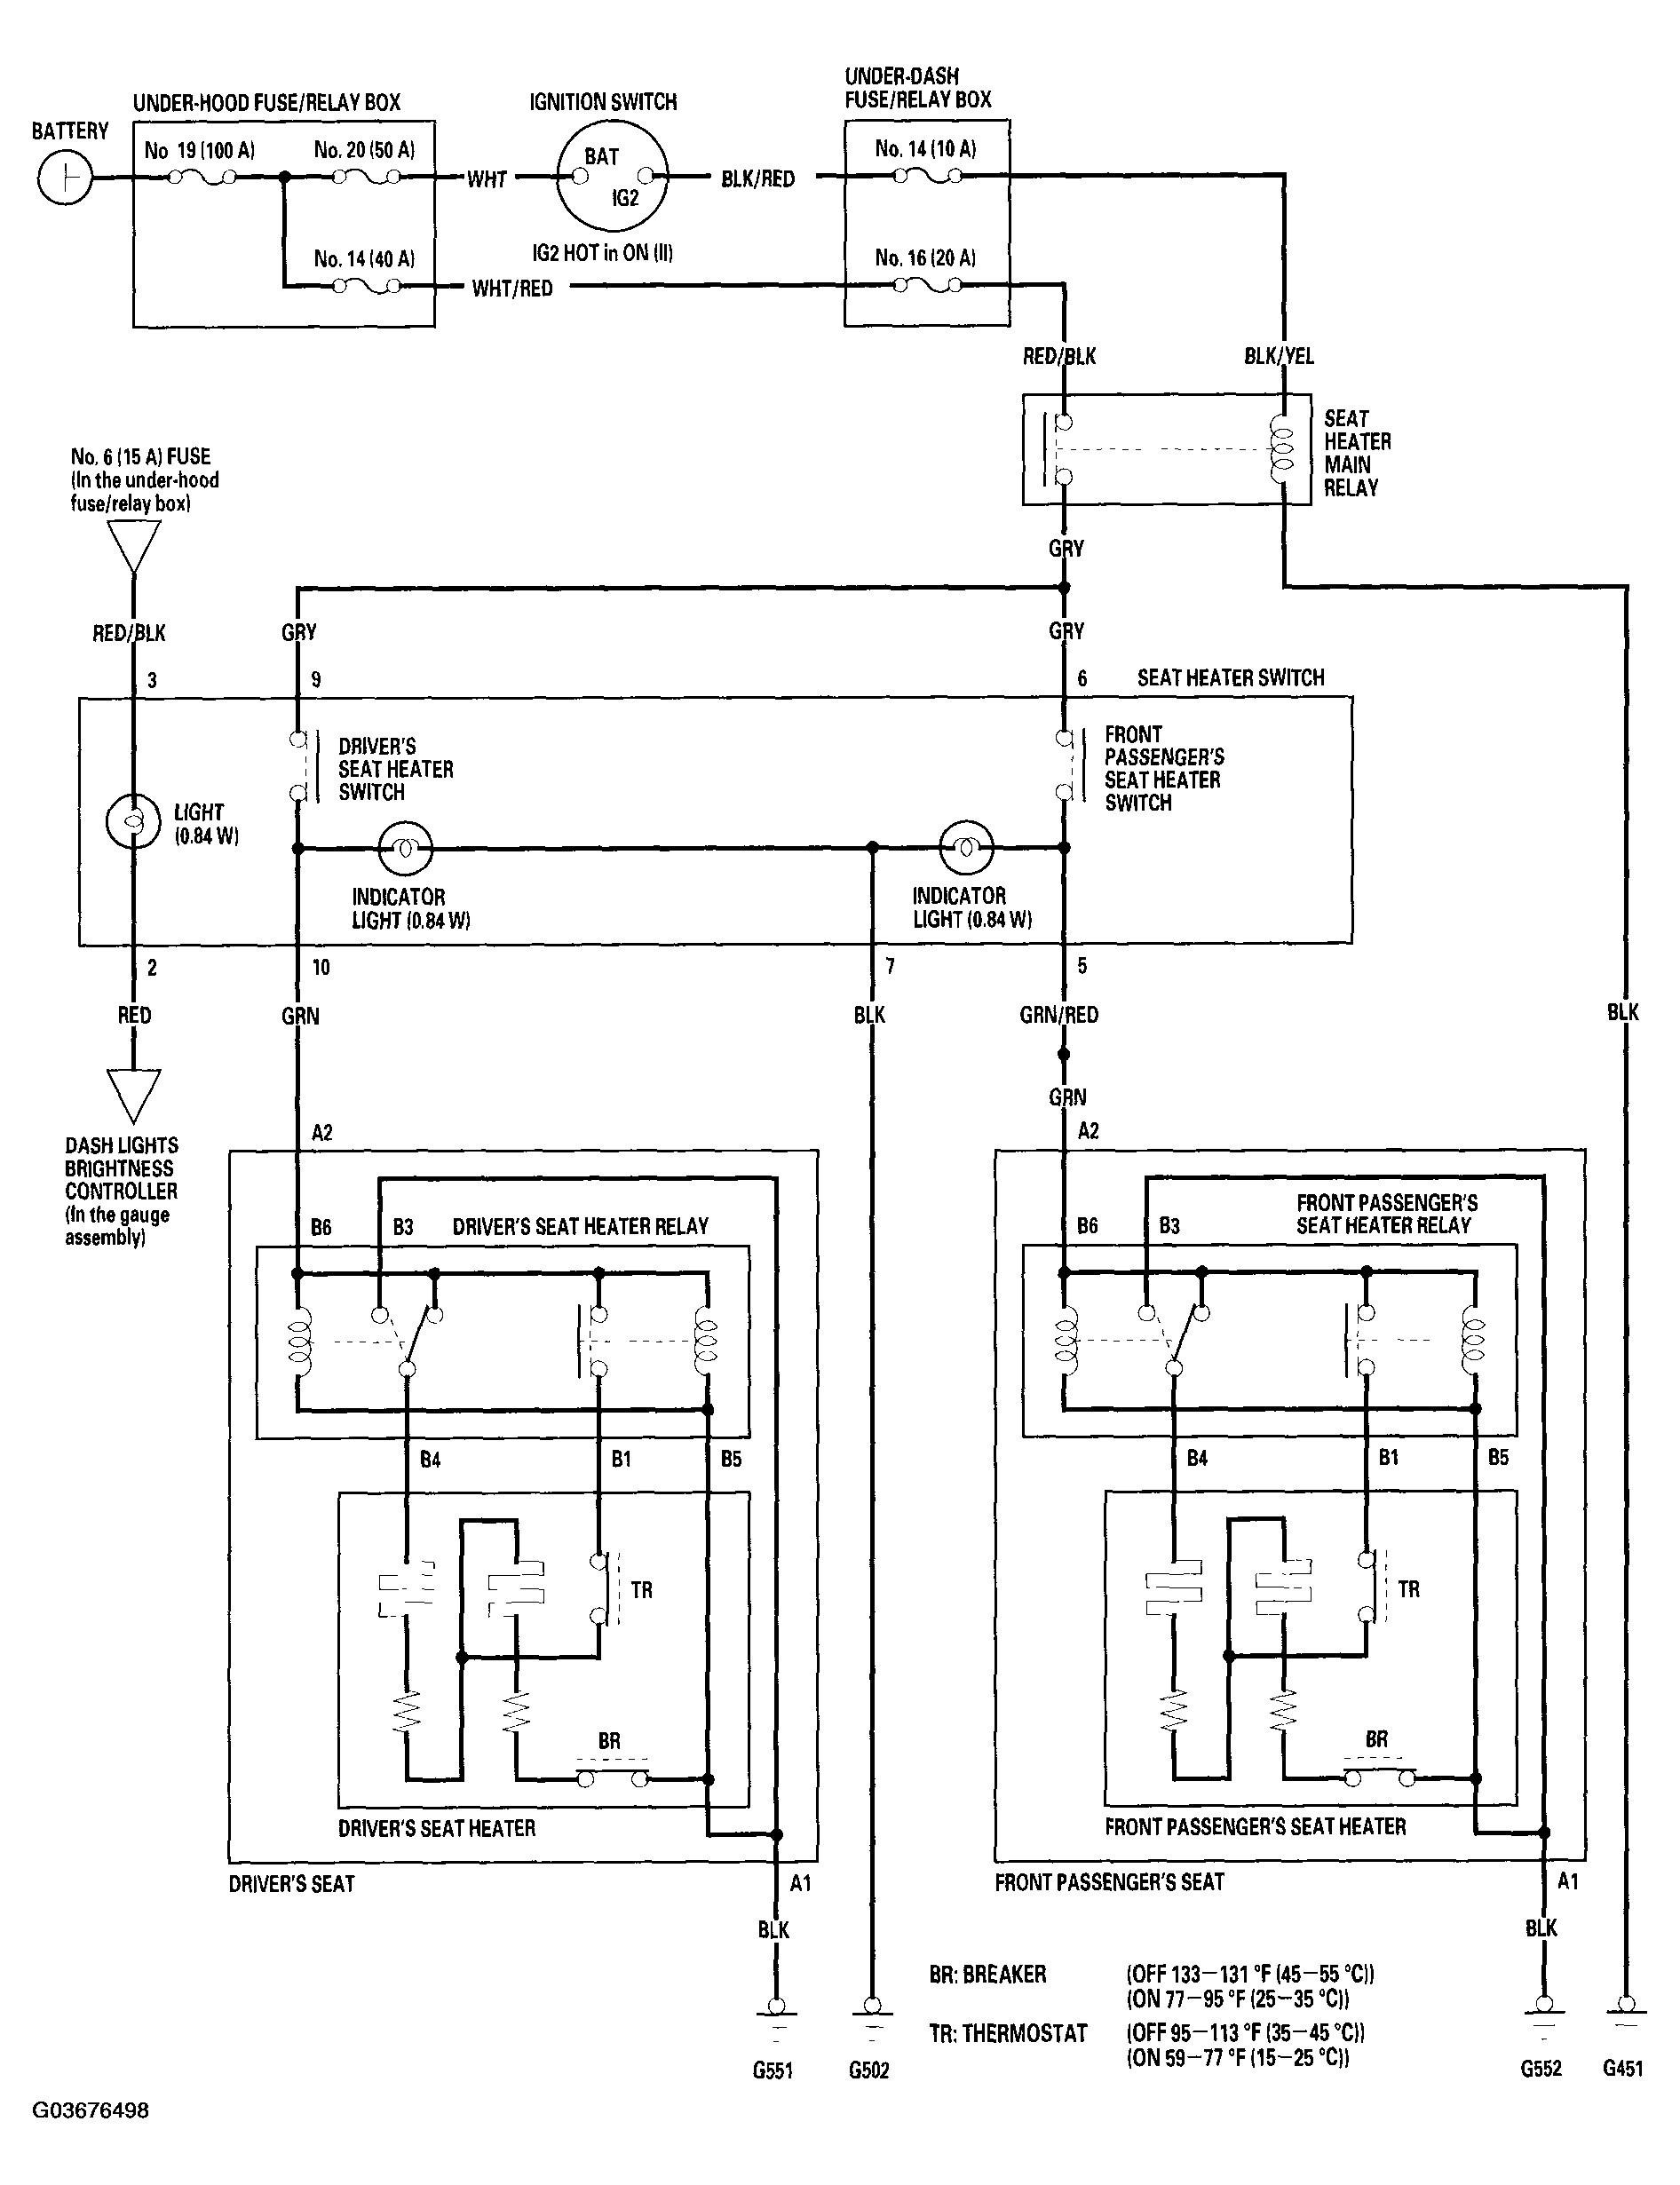 2005 Honda Civic Engine Diagram Best 2006 Honda Civic Relay Diagram • Electrical Outlet Symbol 2018 Of 2005 Honda Civic Engine Diagram